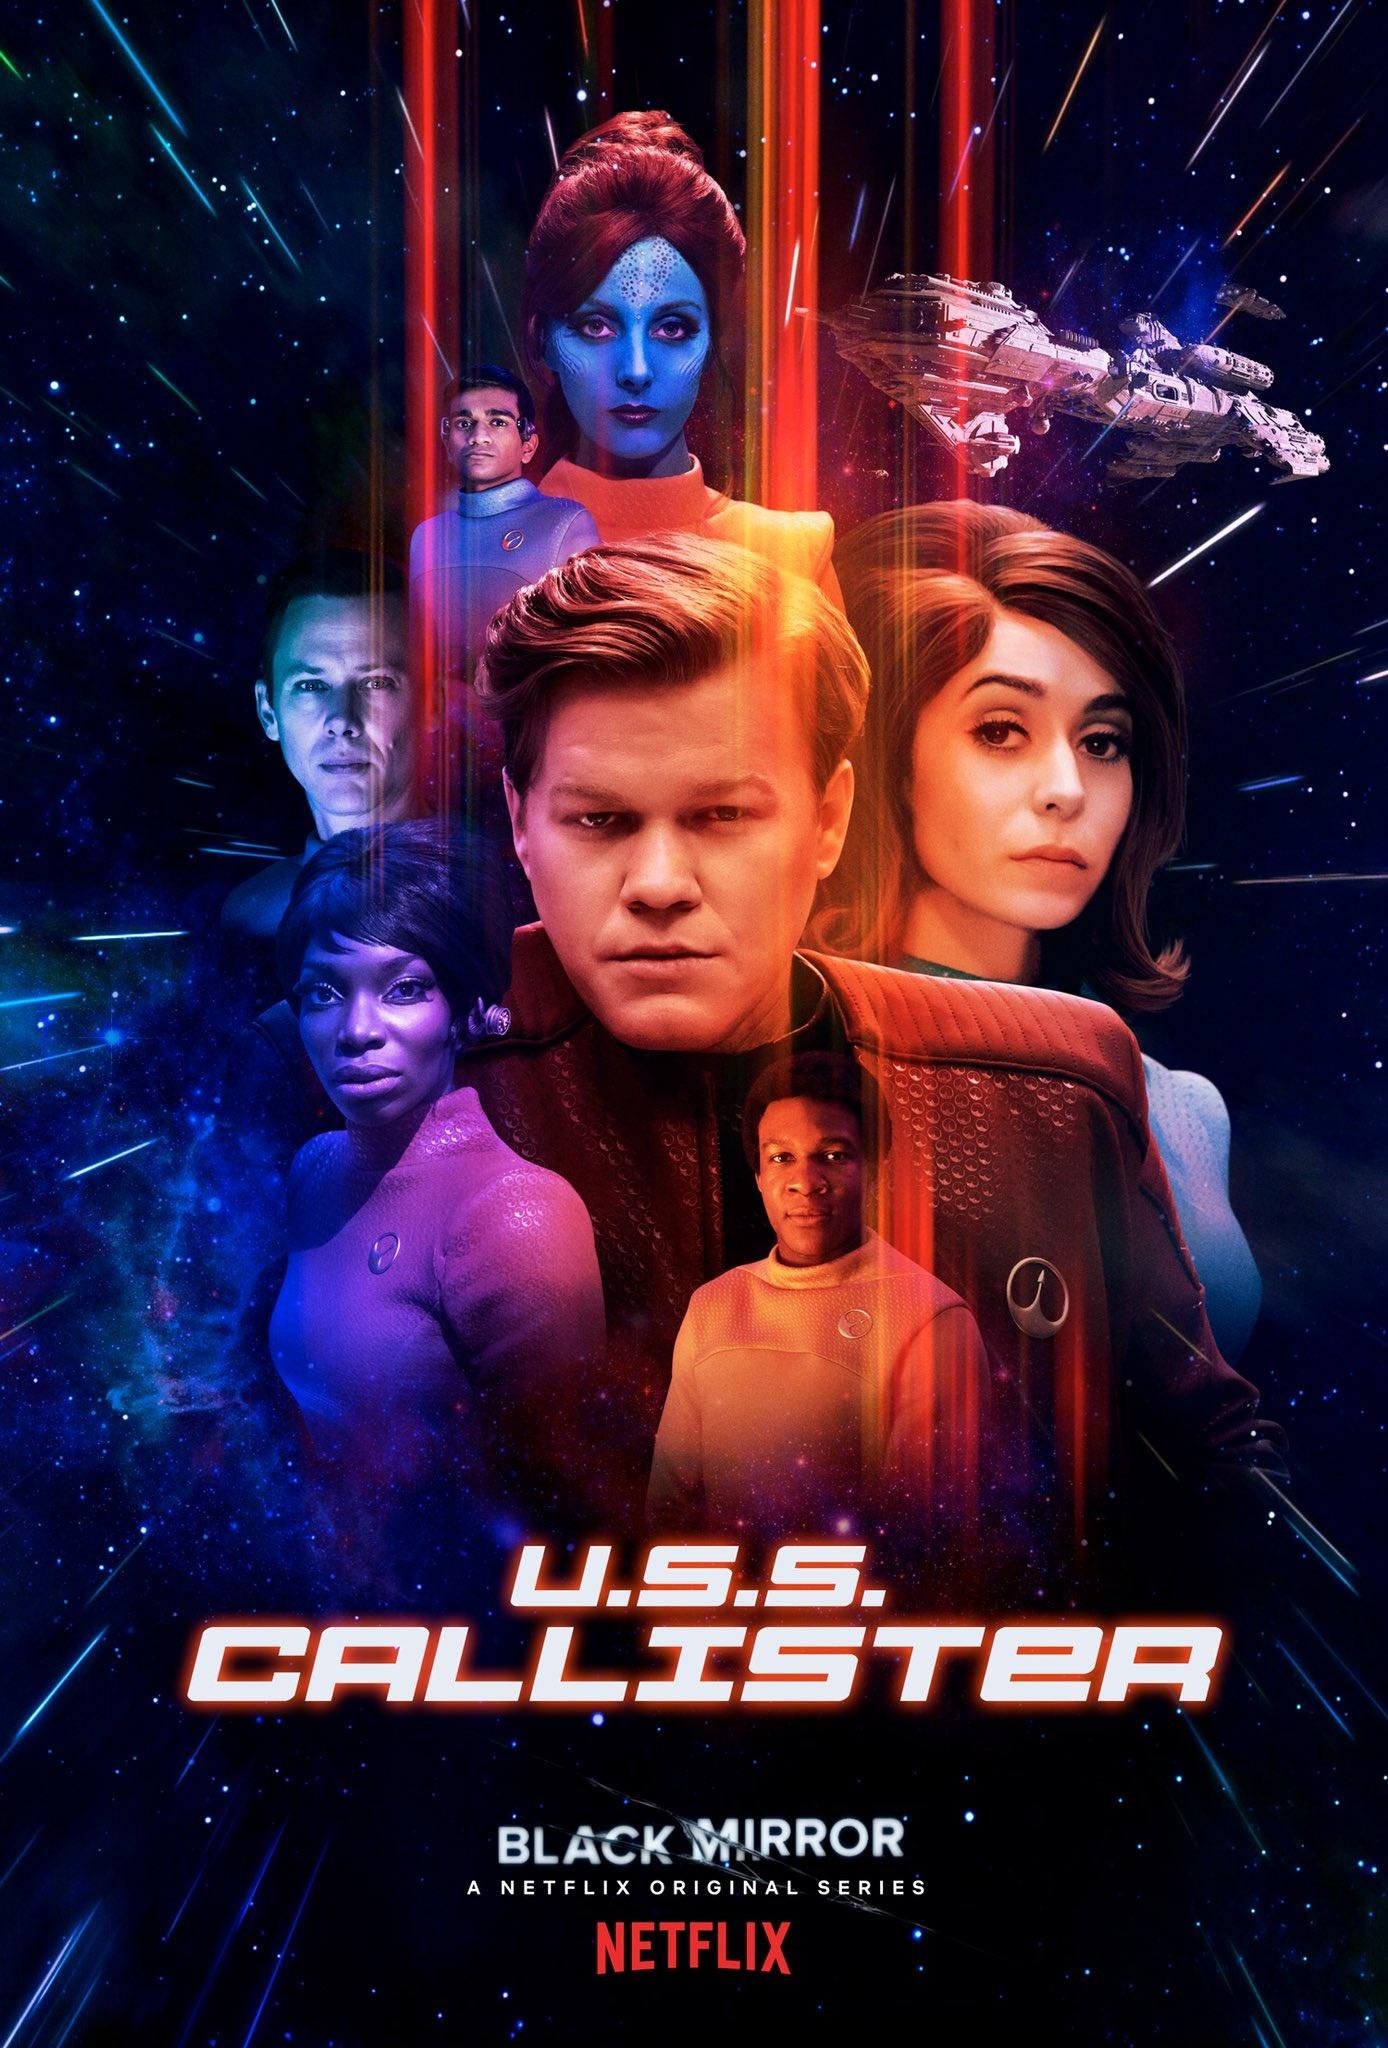 https://seriesaddict.fr/images/galerie/originals/Black-Mirror/Posters-saison-4/Poster-USS-Callister-Black-Mirror-Saison-4.jpg